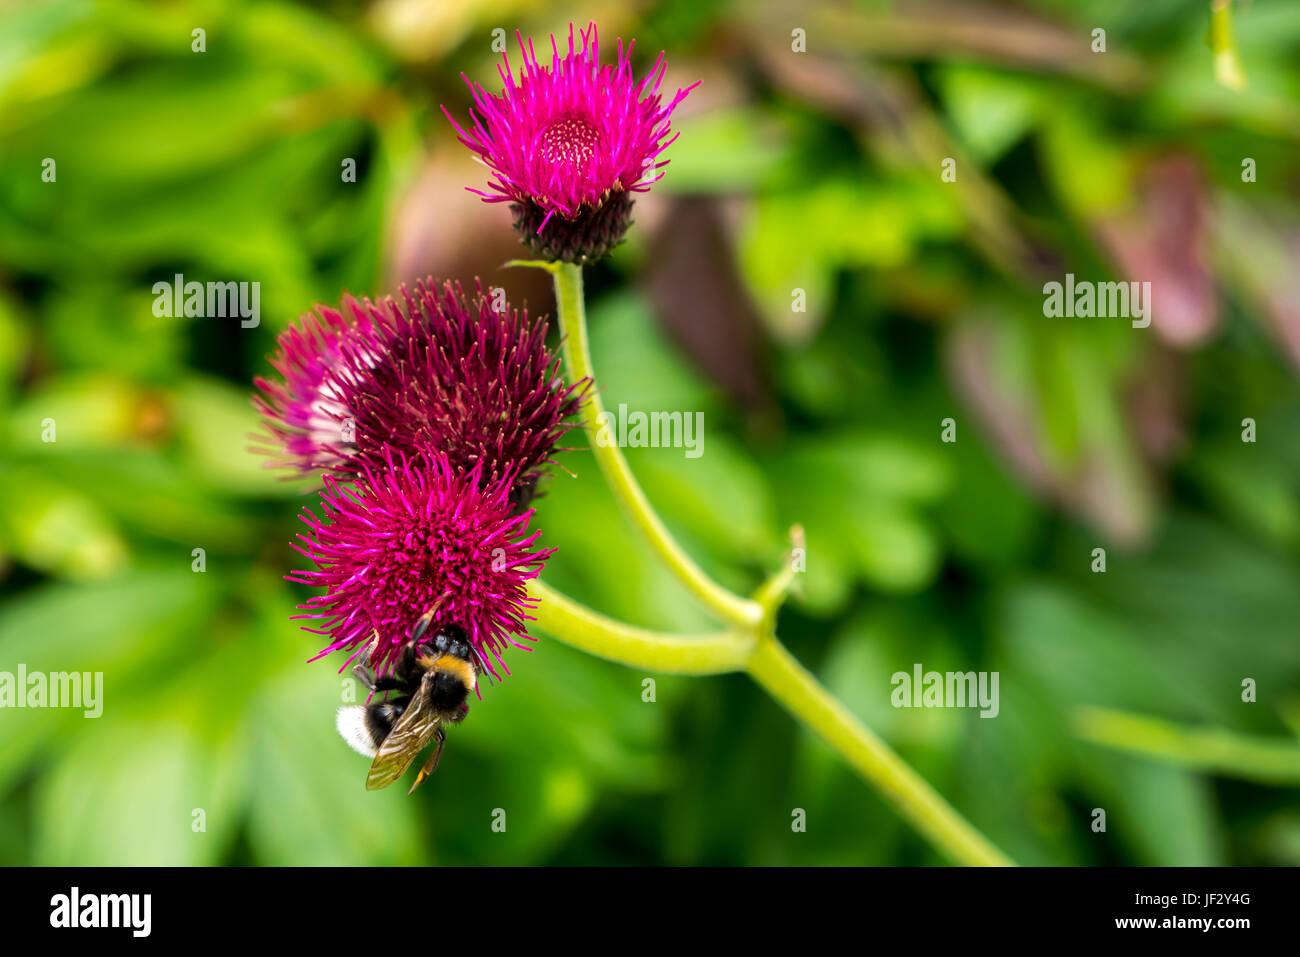 Close up of bumblebee on magenta thistle, Cirsium rivulare Atropurpureum, with blurred background, Dirleton Castle - Stock Image